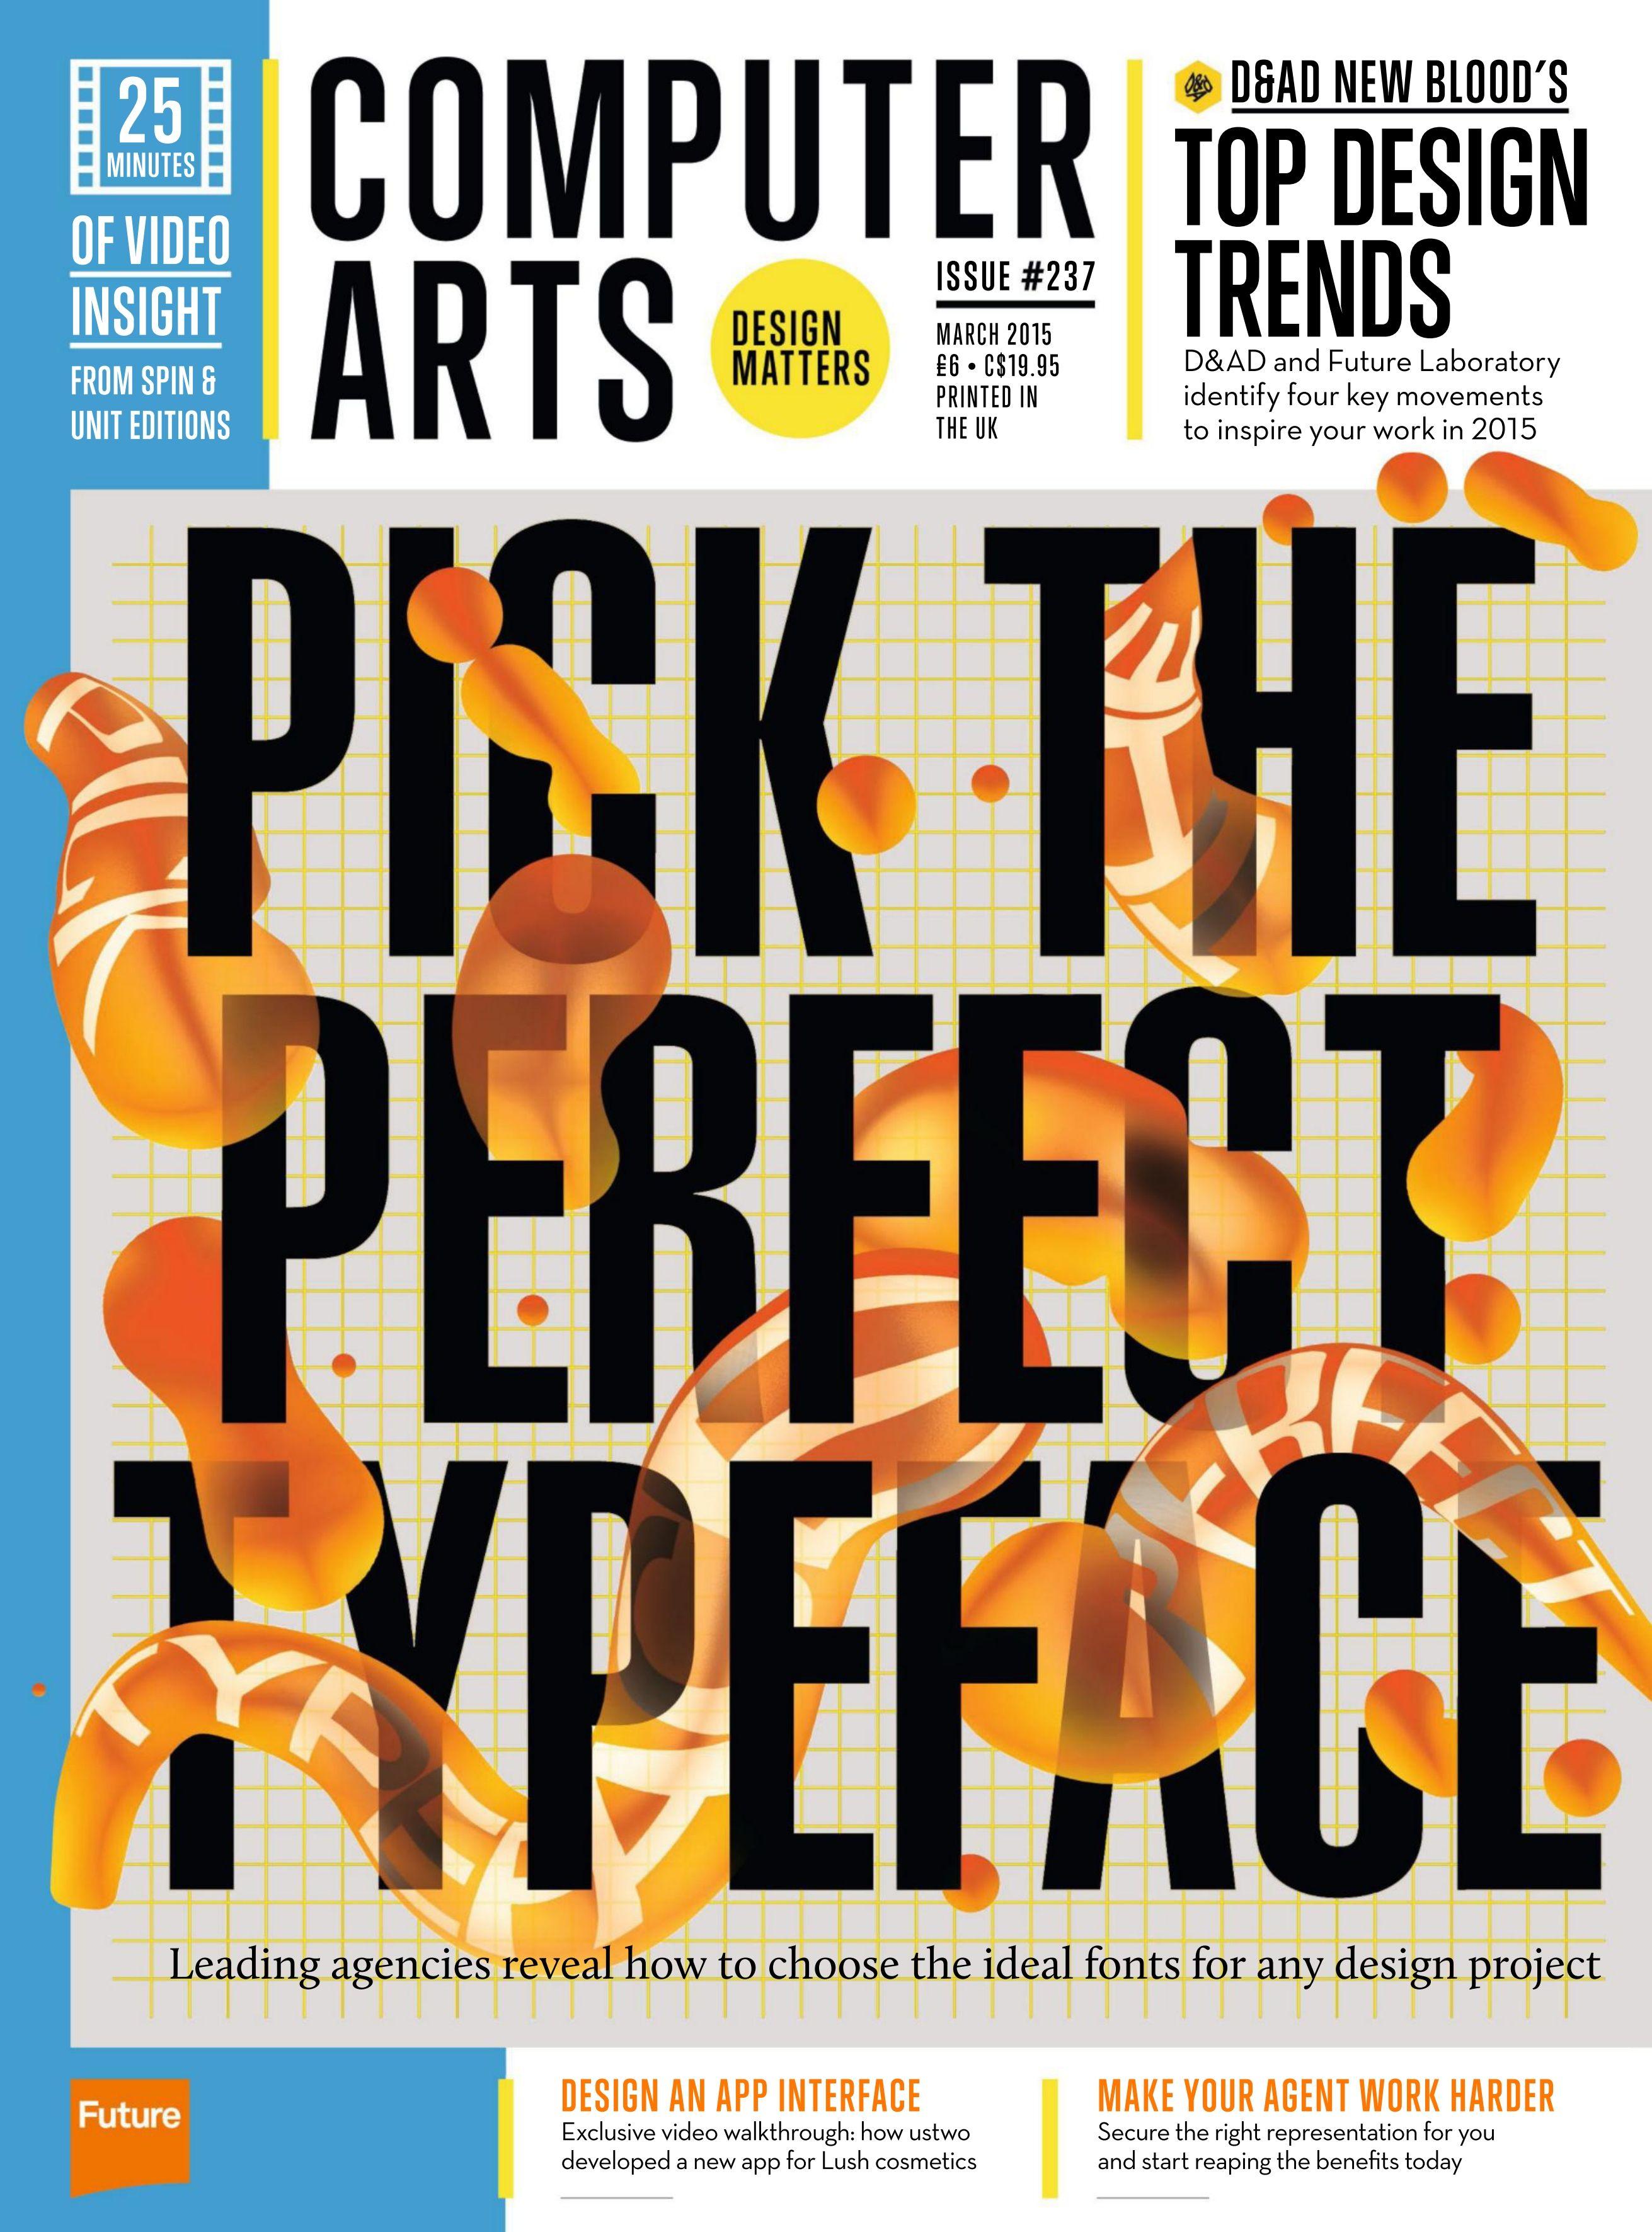 #computer #arts Magazine 237 Pick The Perfect #typeface!